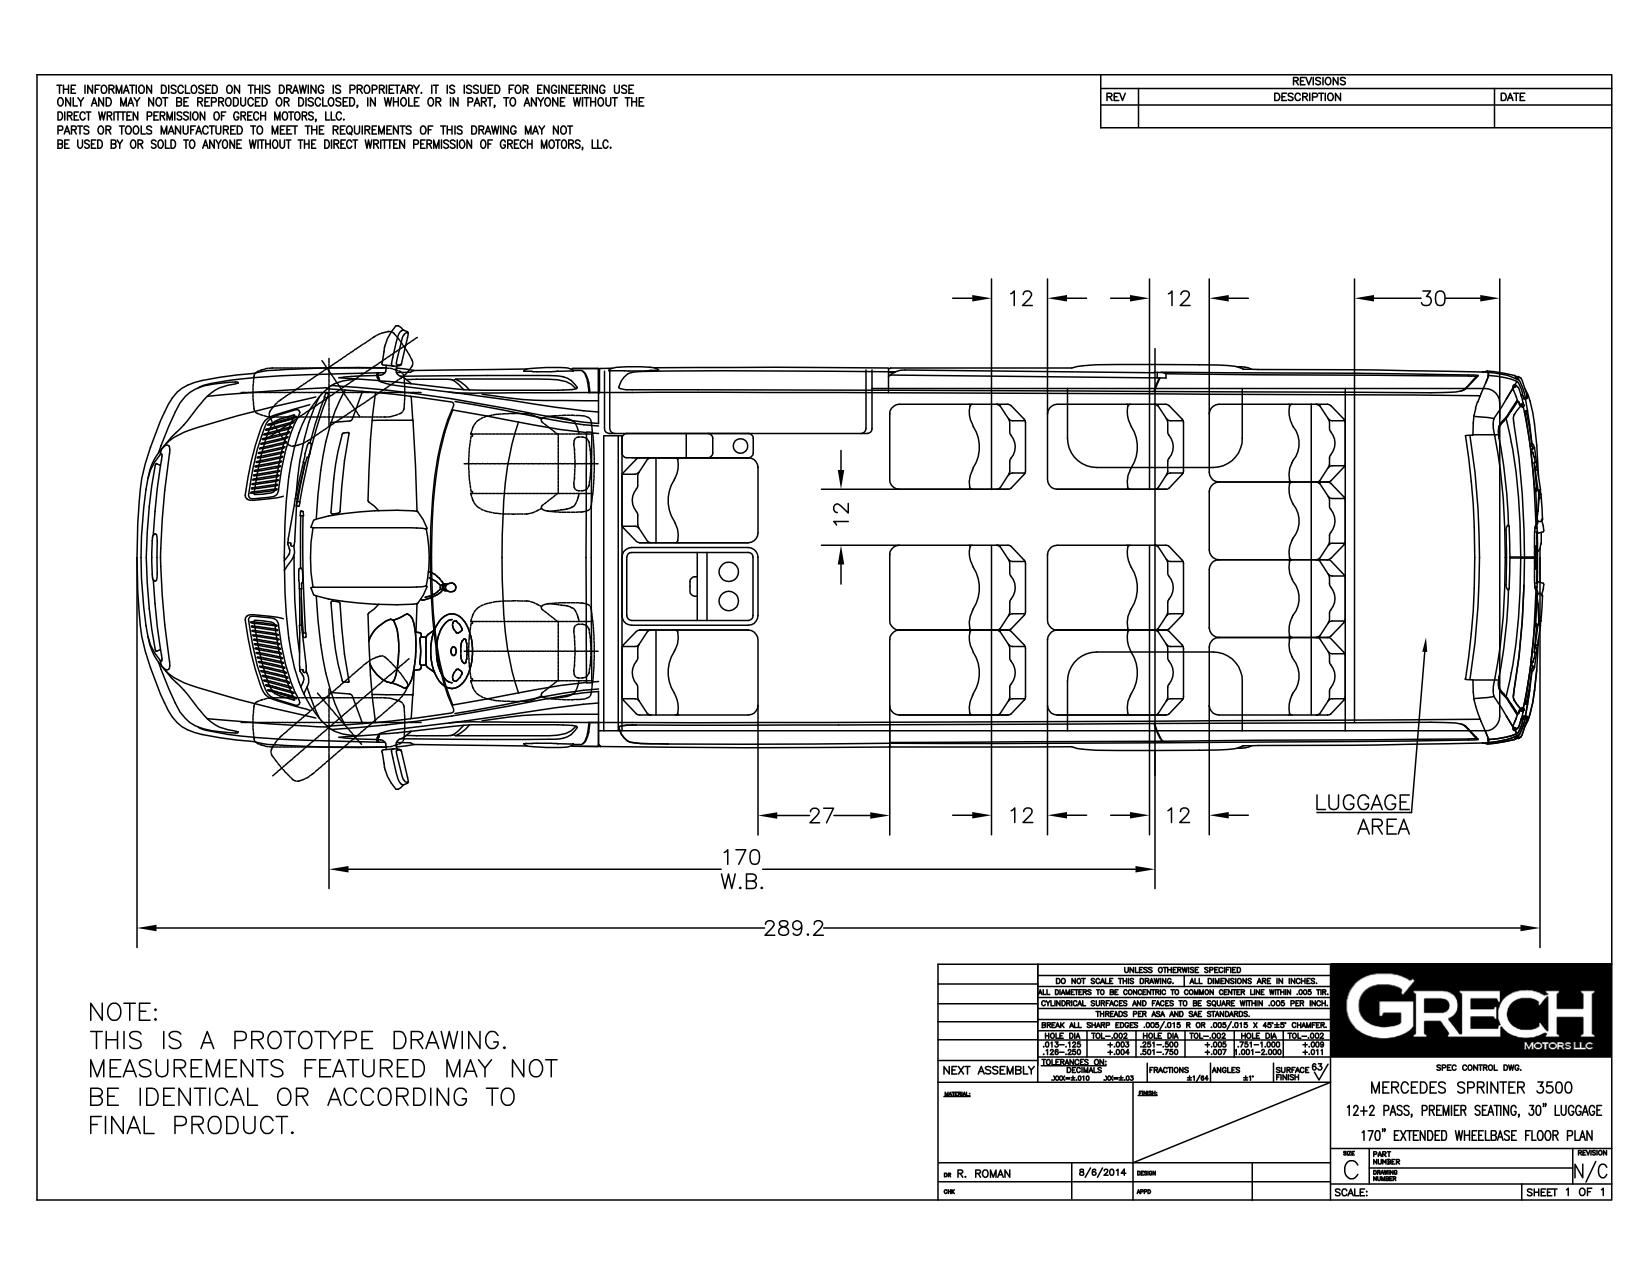 Grech Motors Executive Sprinter floor plan